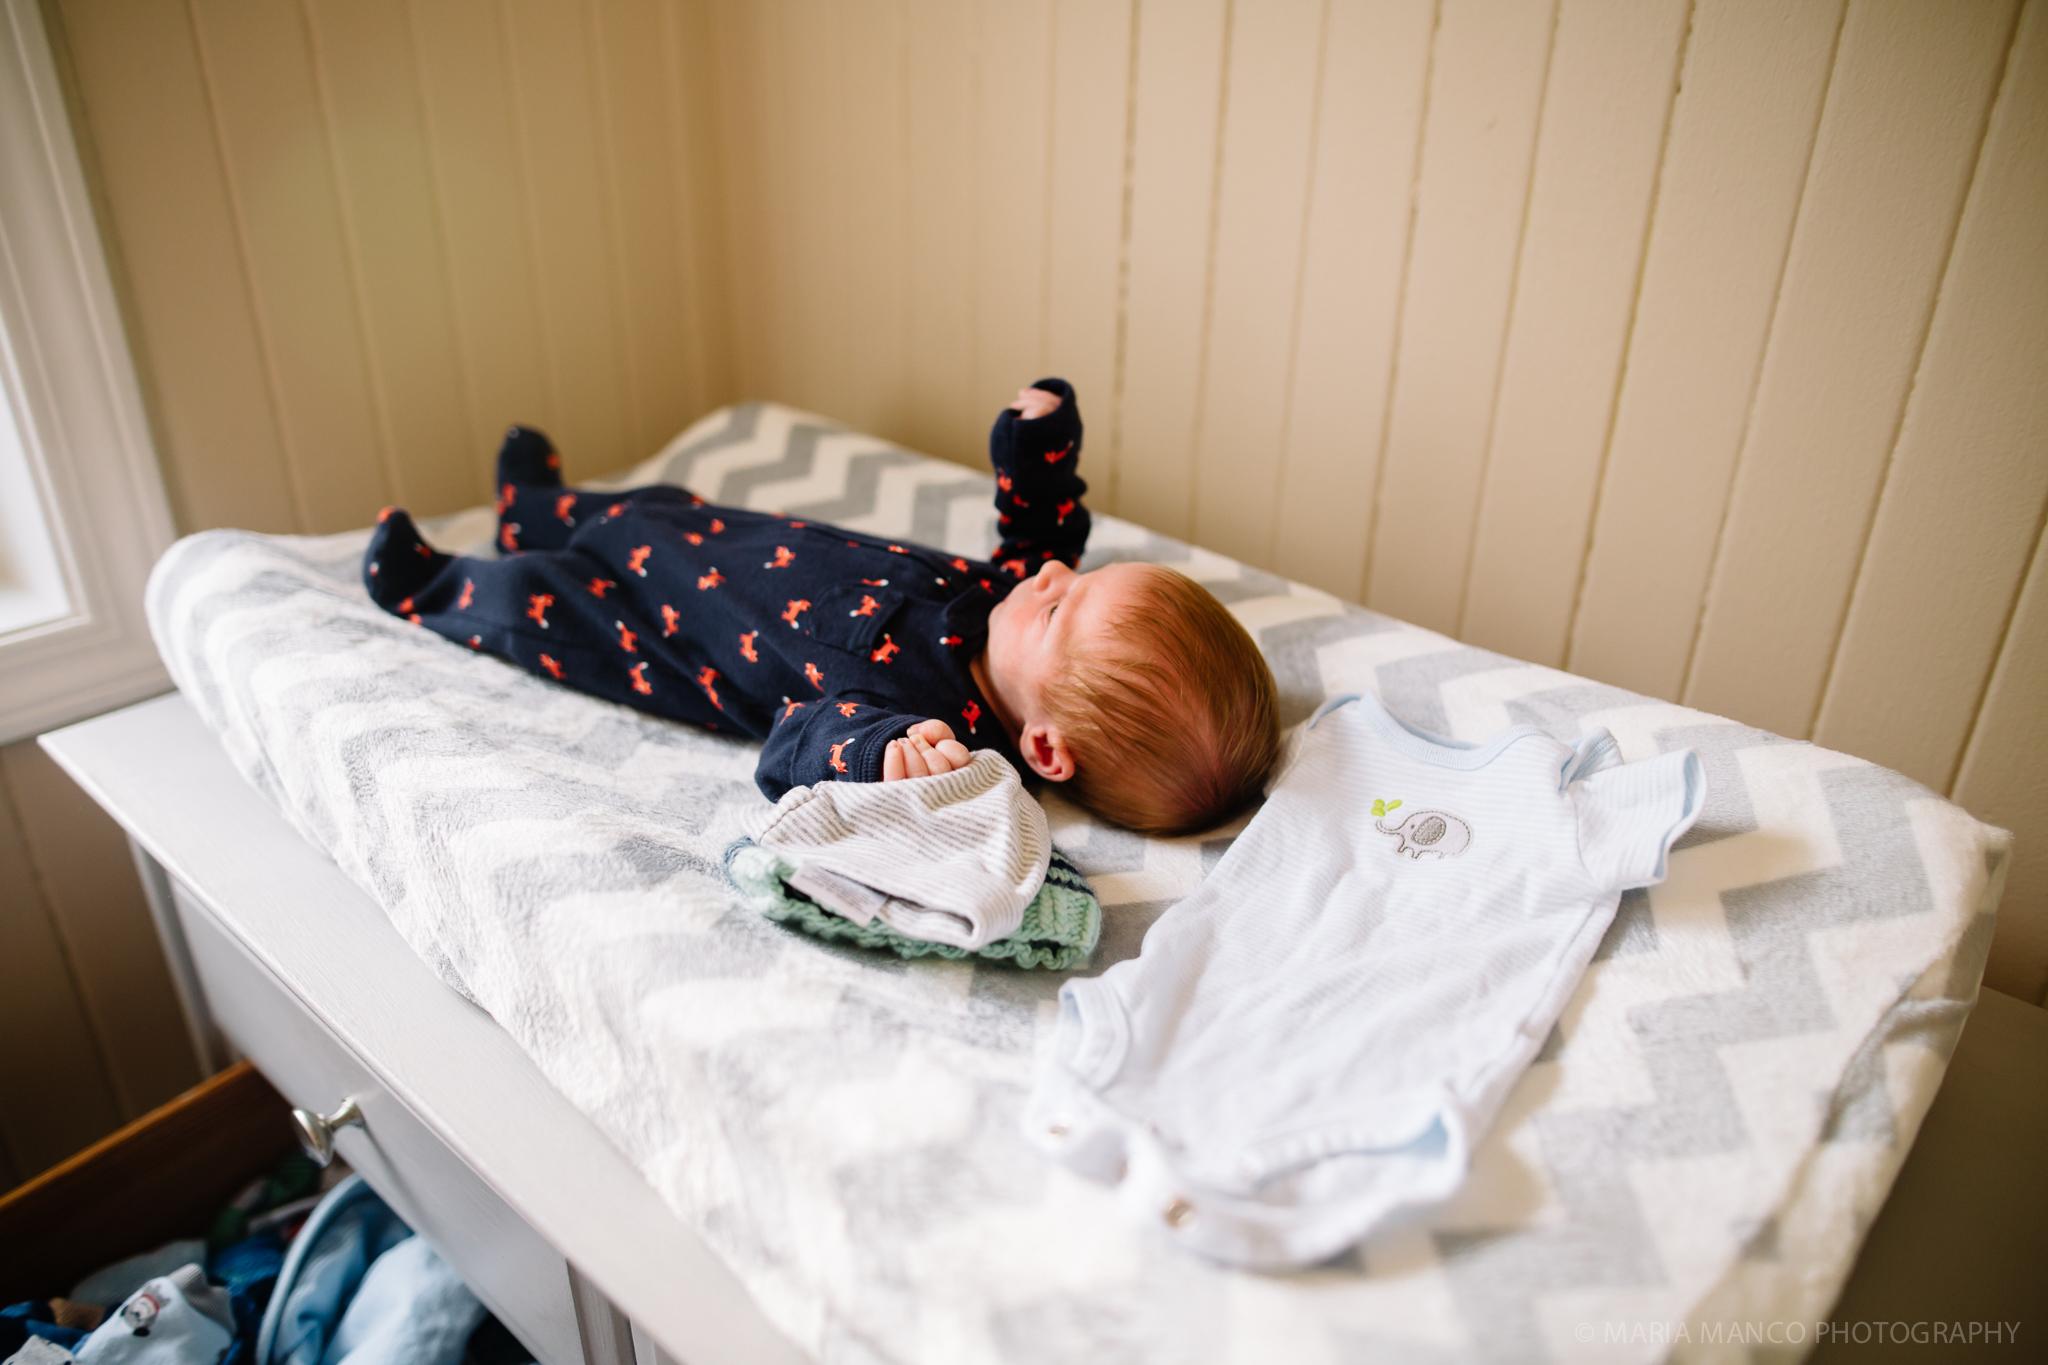 cleveland family photography clevelandphotographer newborn newbornphotos lifestyle westlake ohio in-home documentary baby maria manco 2